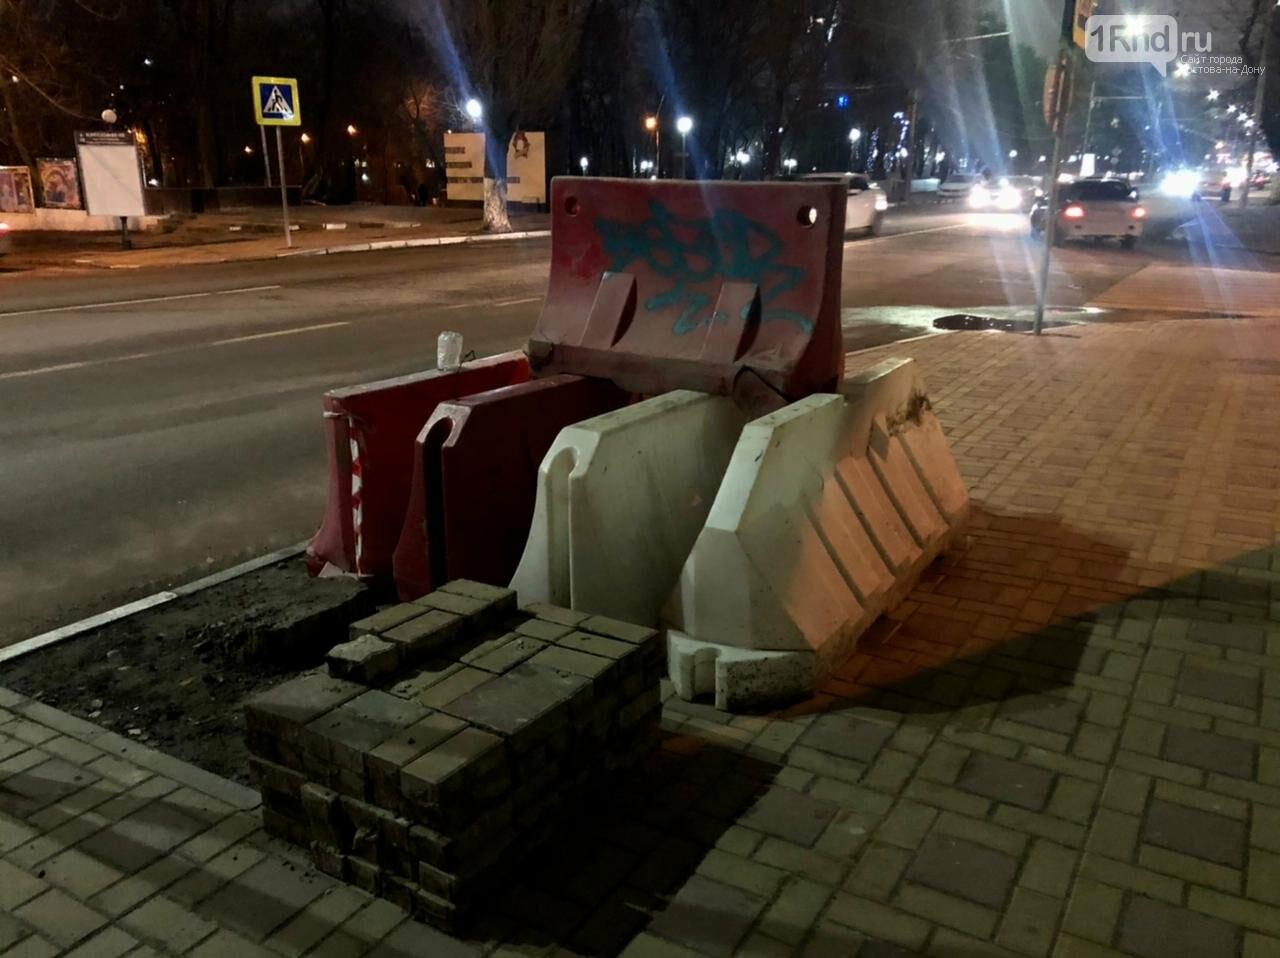 Яму закрыли барьерами, Фото - 1rnd